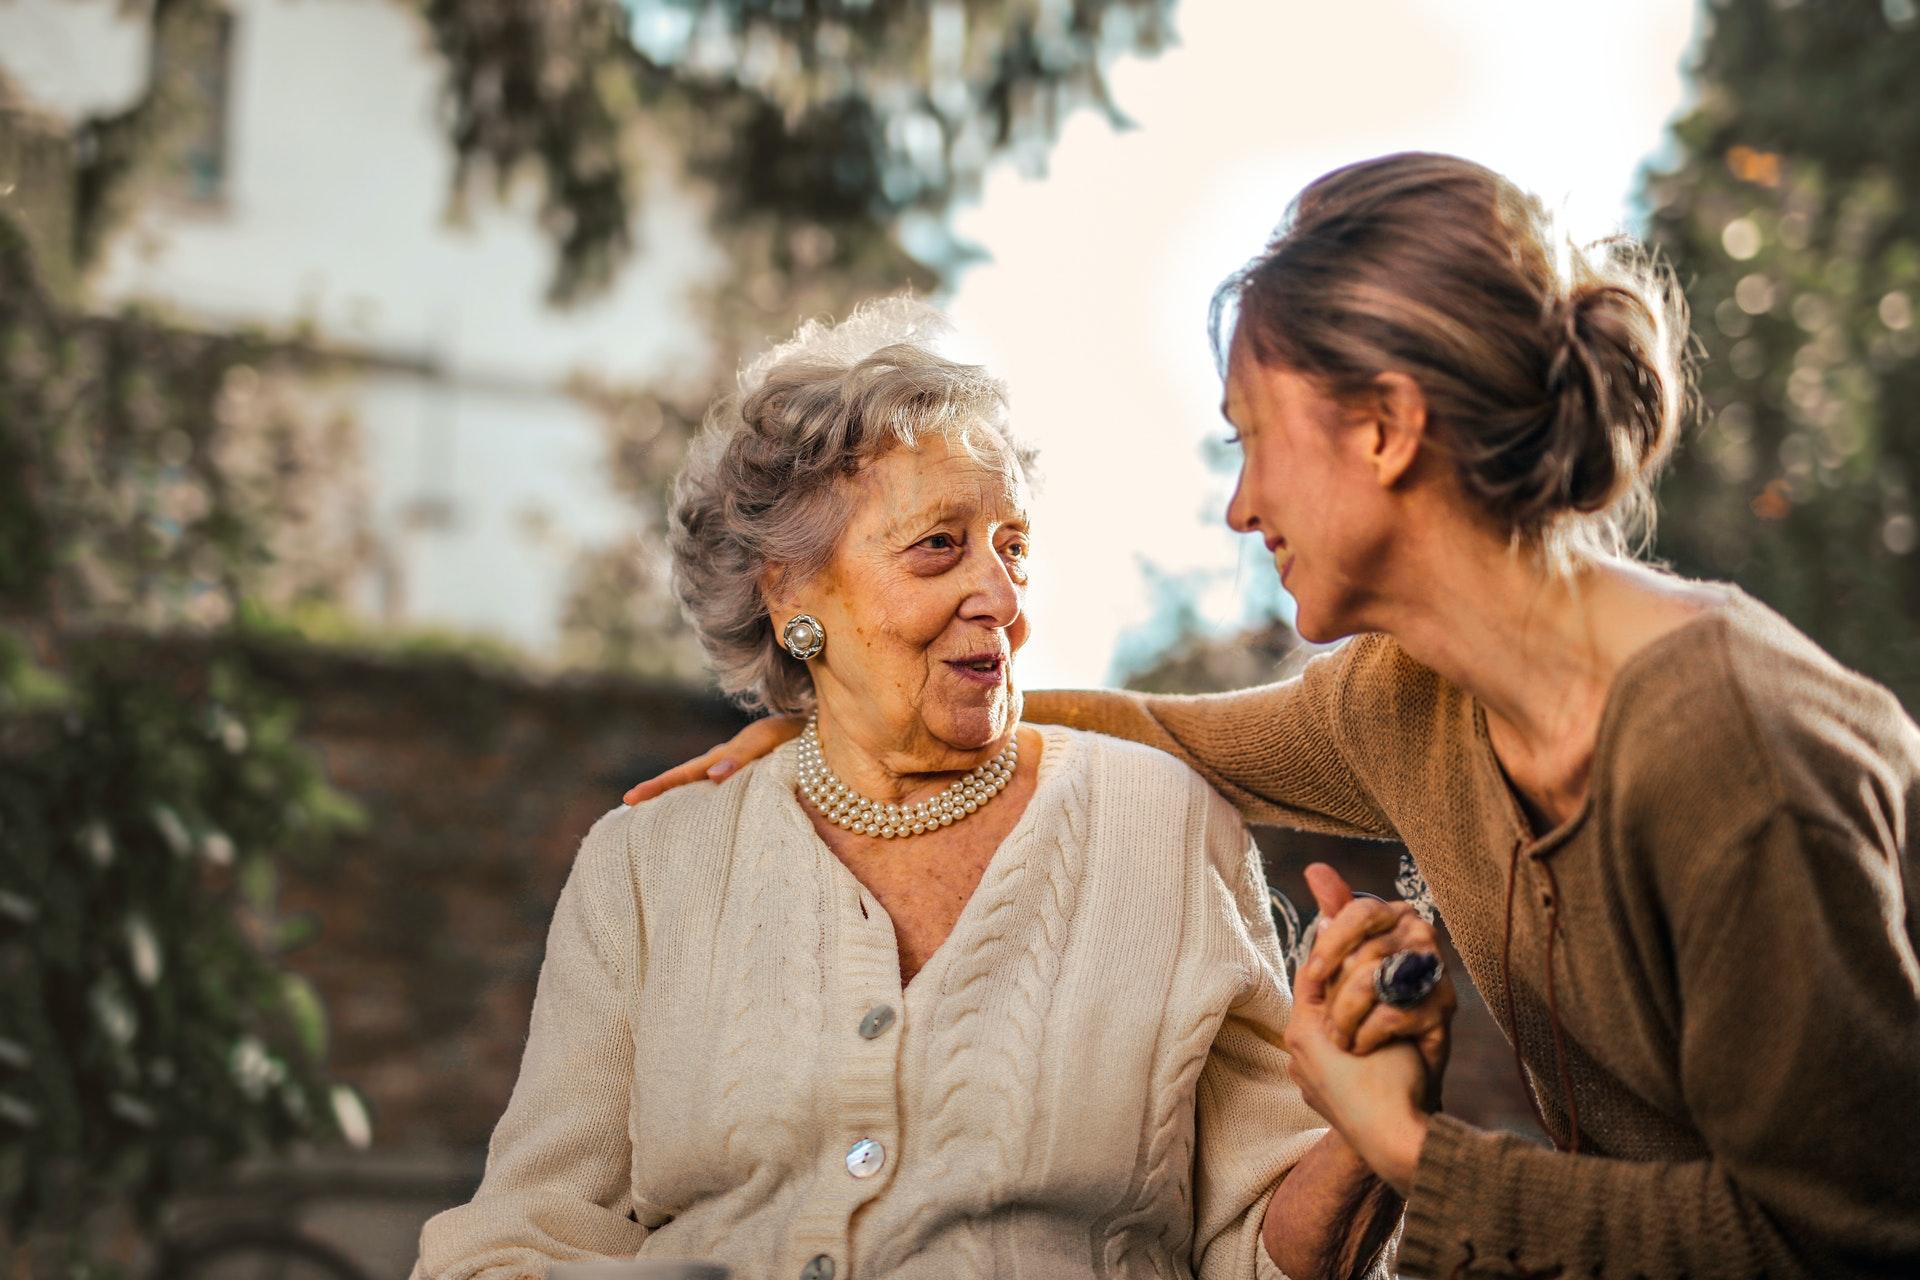 Alchajmerova bolest, briga o starijima